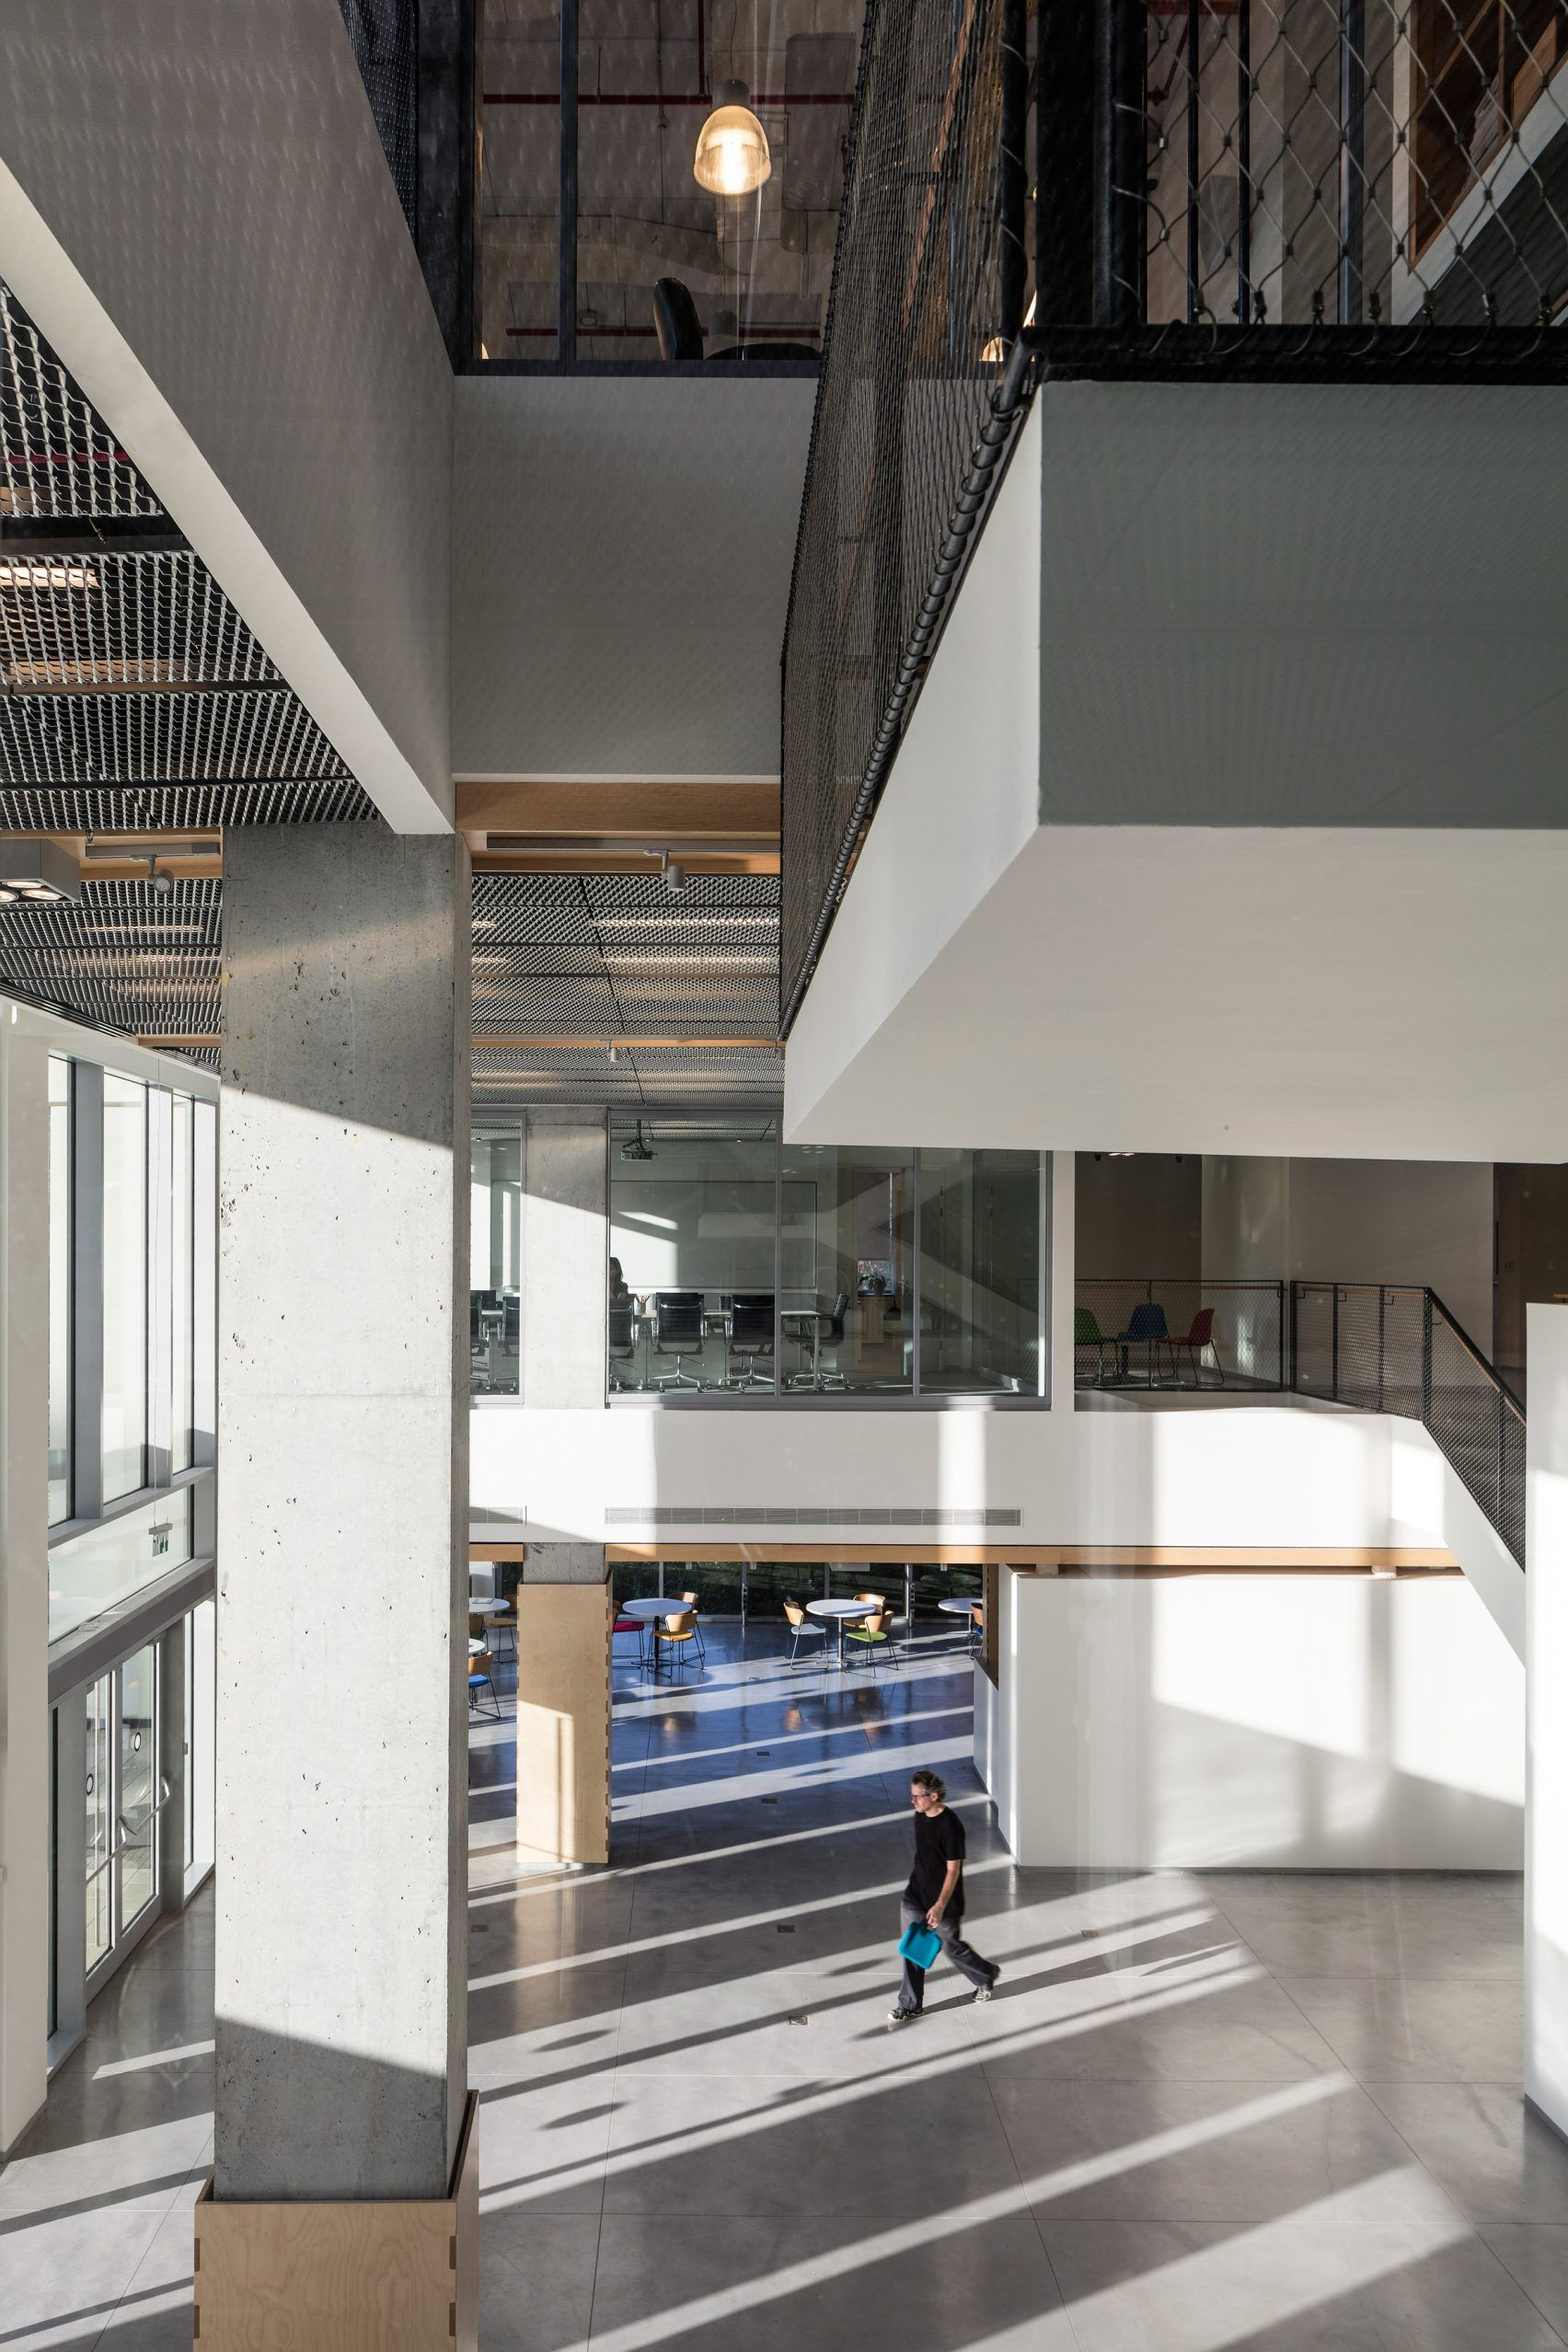 Fins Of Metal Mesh And Concrete Shield Tel Aviv School Of Entrepreneurship Metal Mesh Concrete Architecture